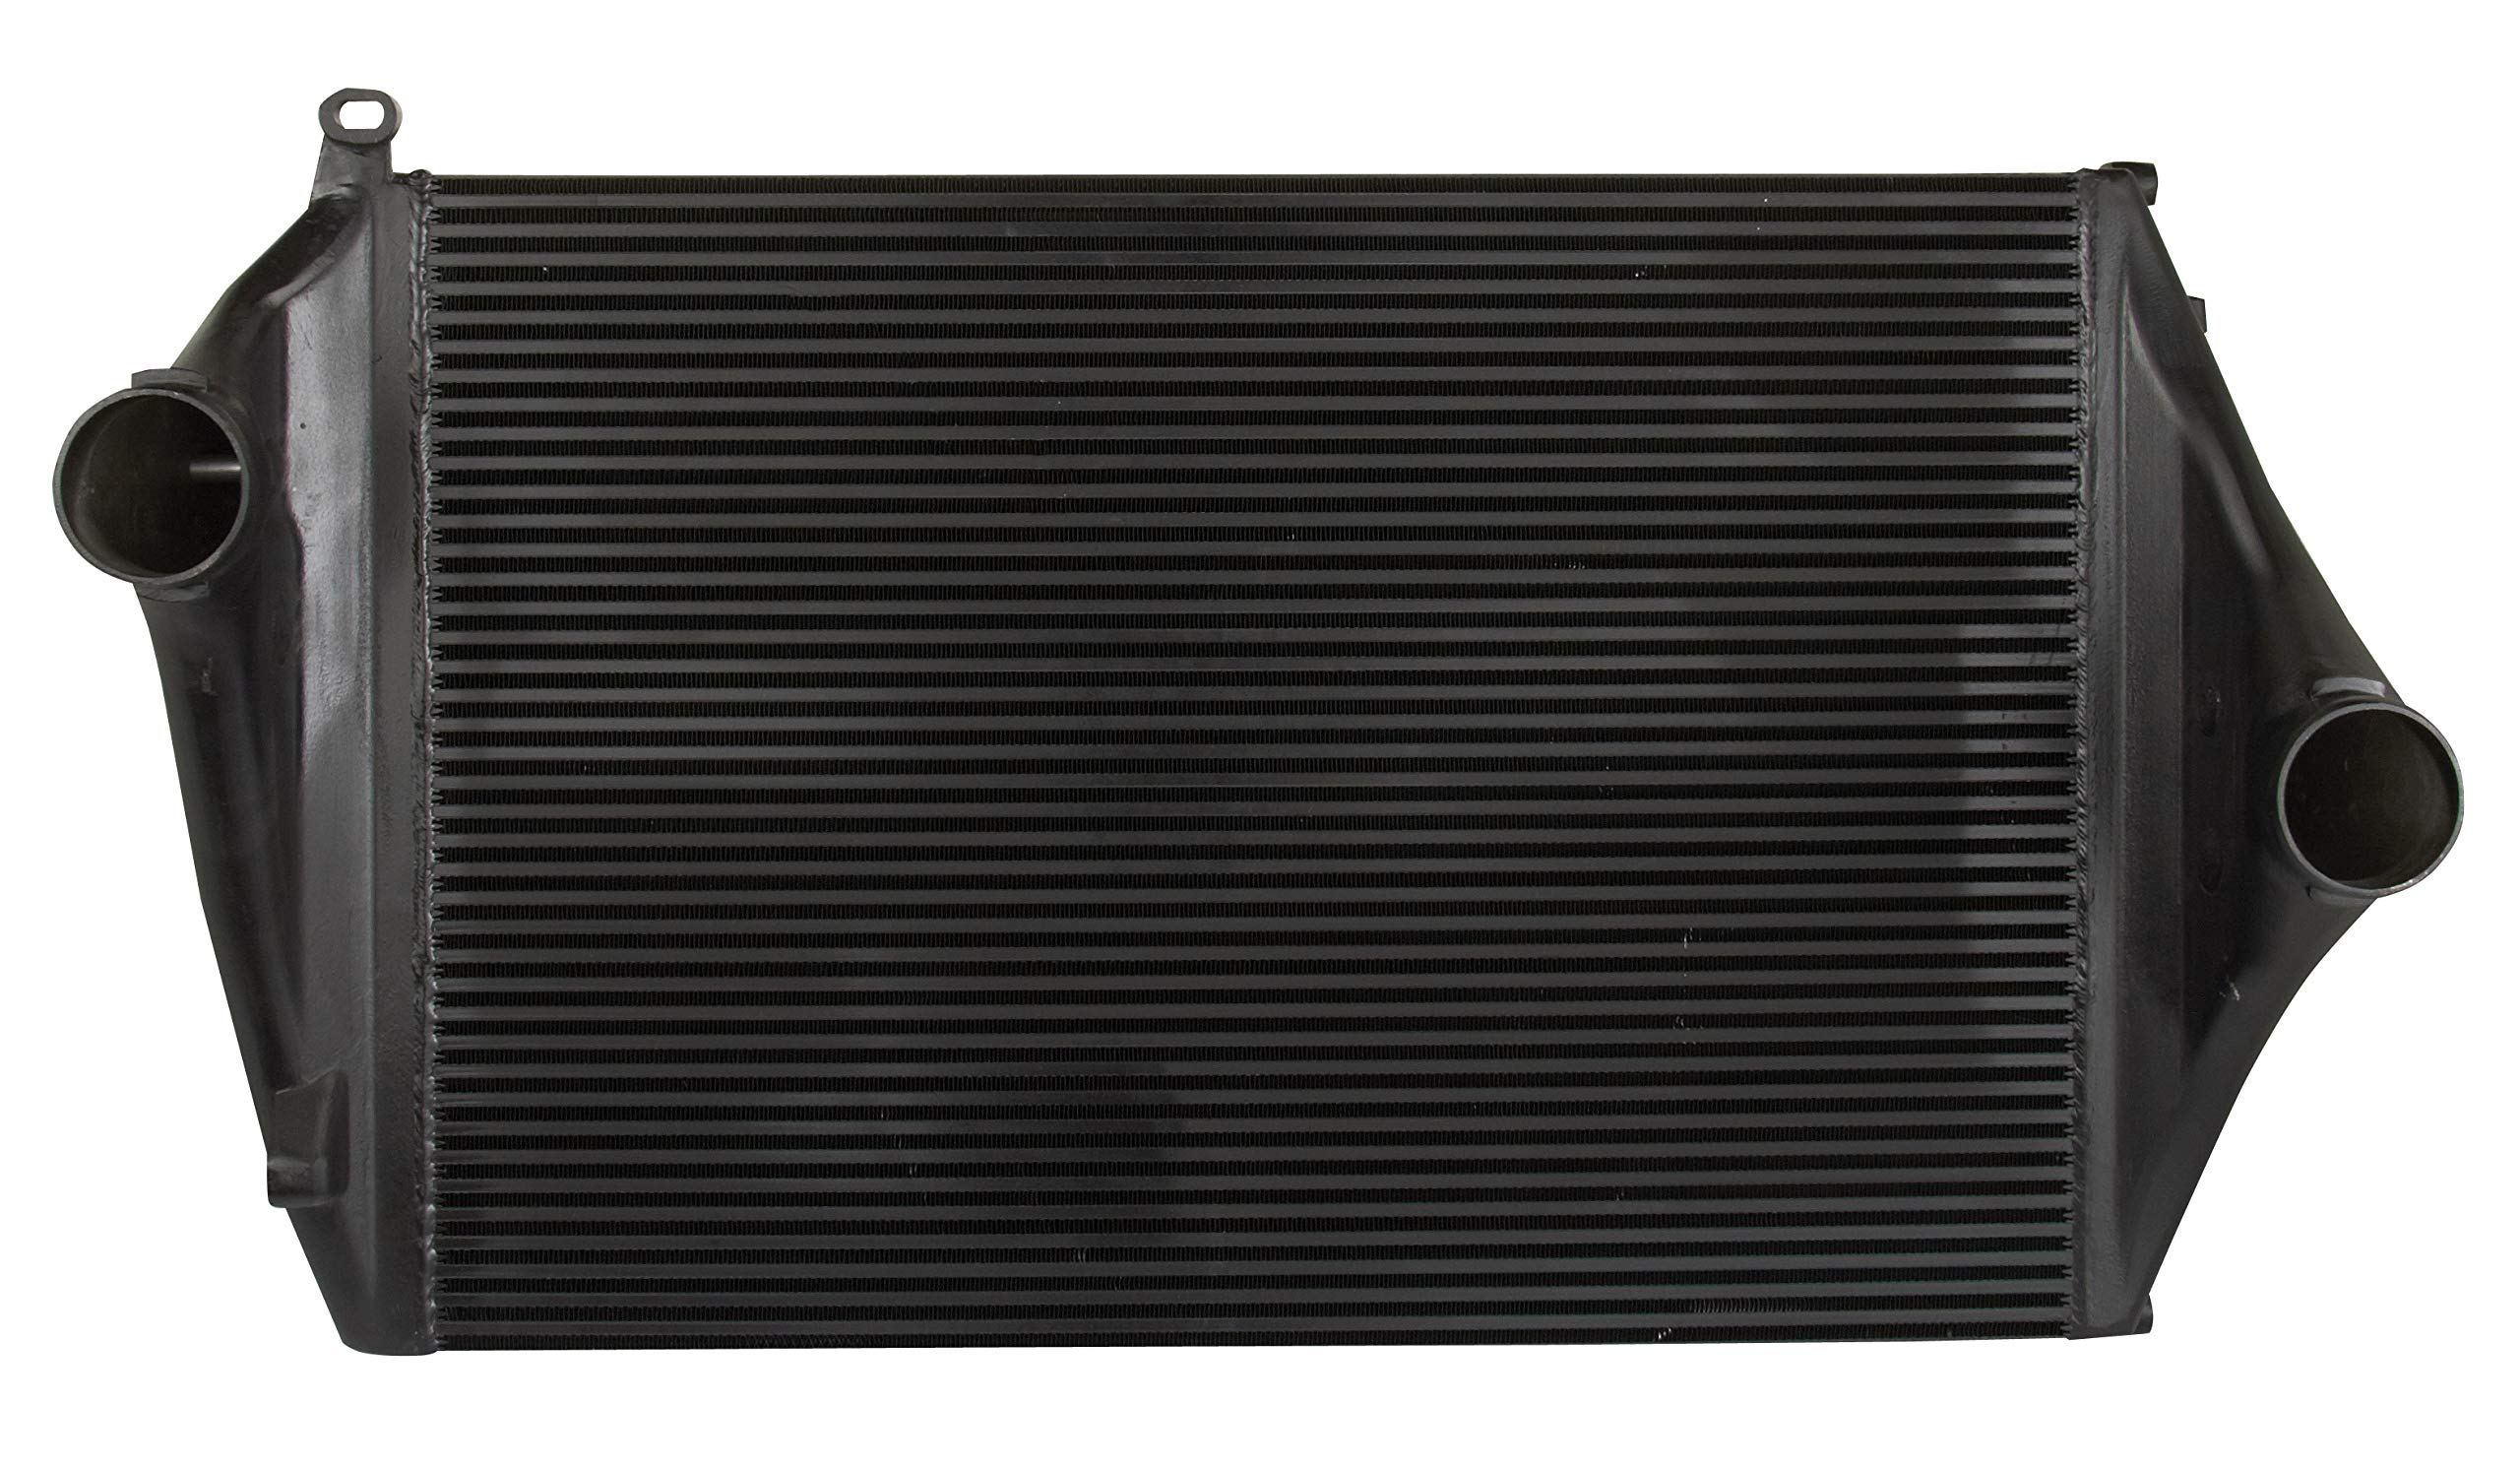 Spectra Premium 4401-1715 Turbocharger Intercooler